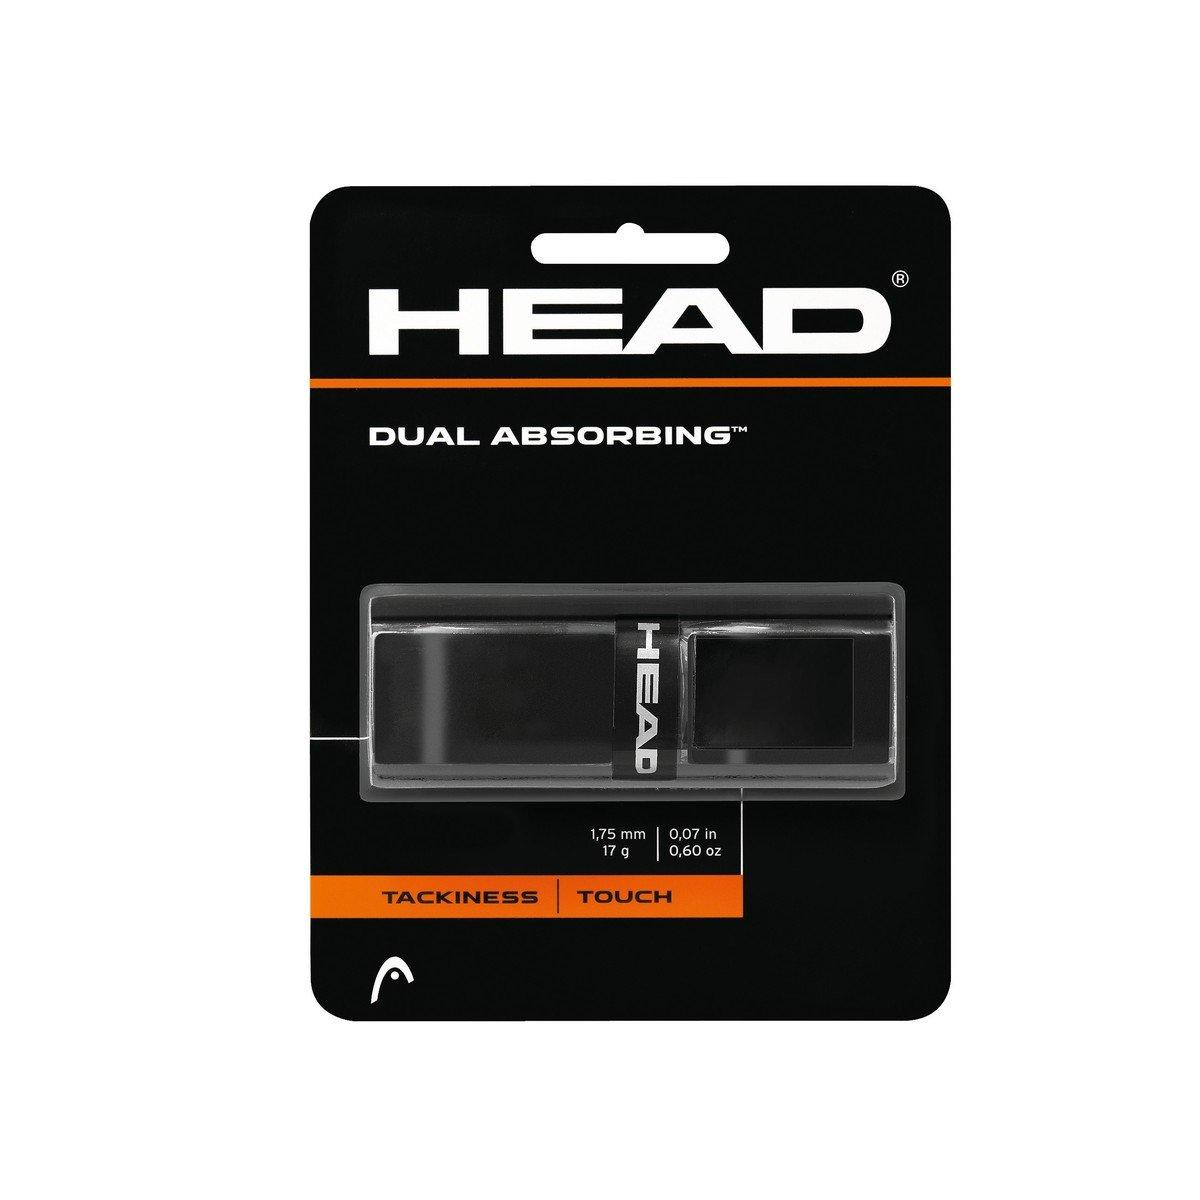 Head Dual Absorbing Grip, Negro, Única 285034-bk